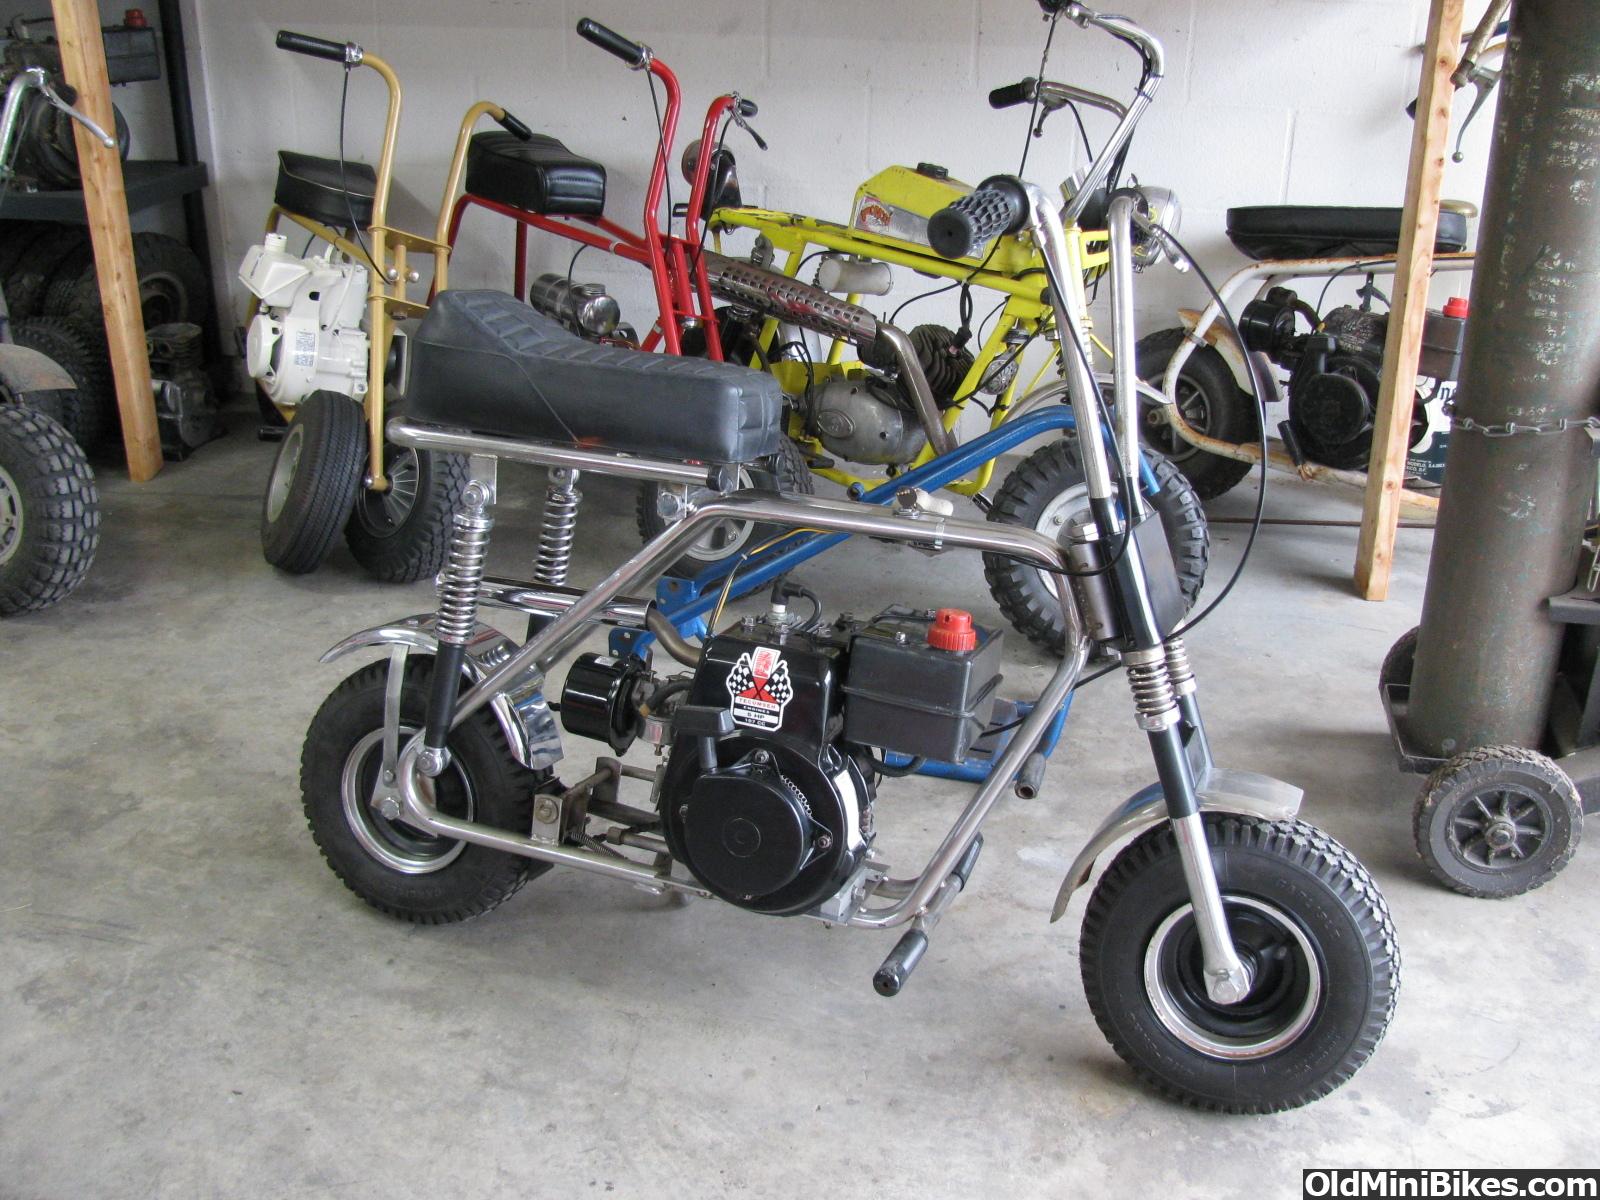 Jc Penney El Tigre Rider Project